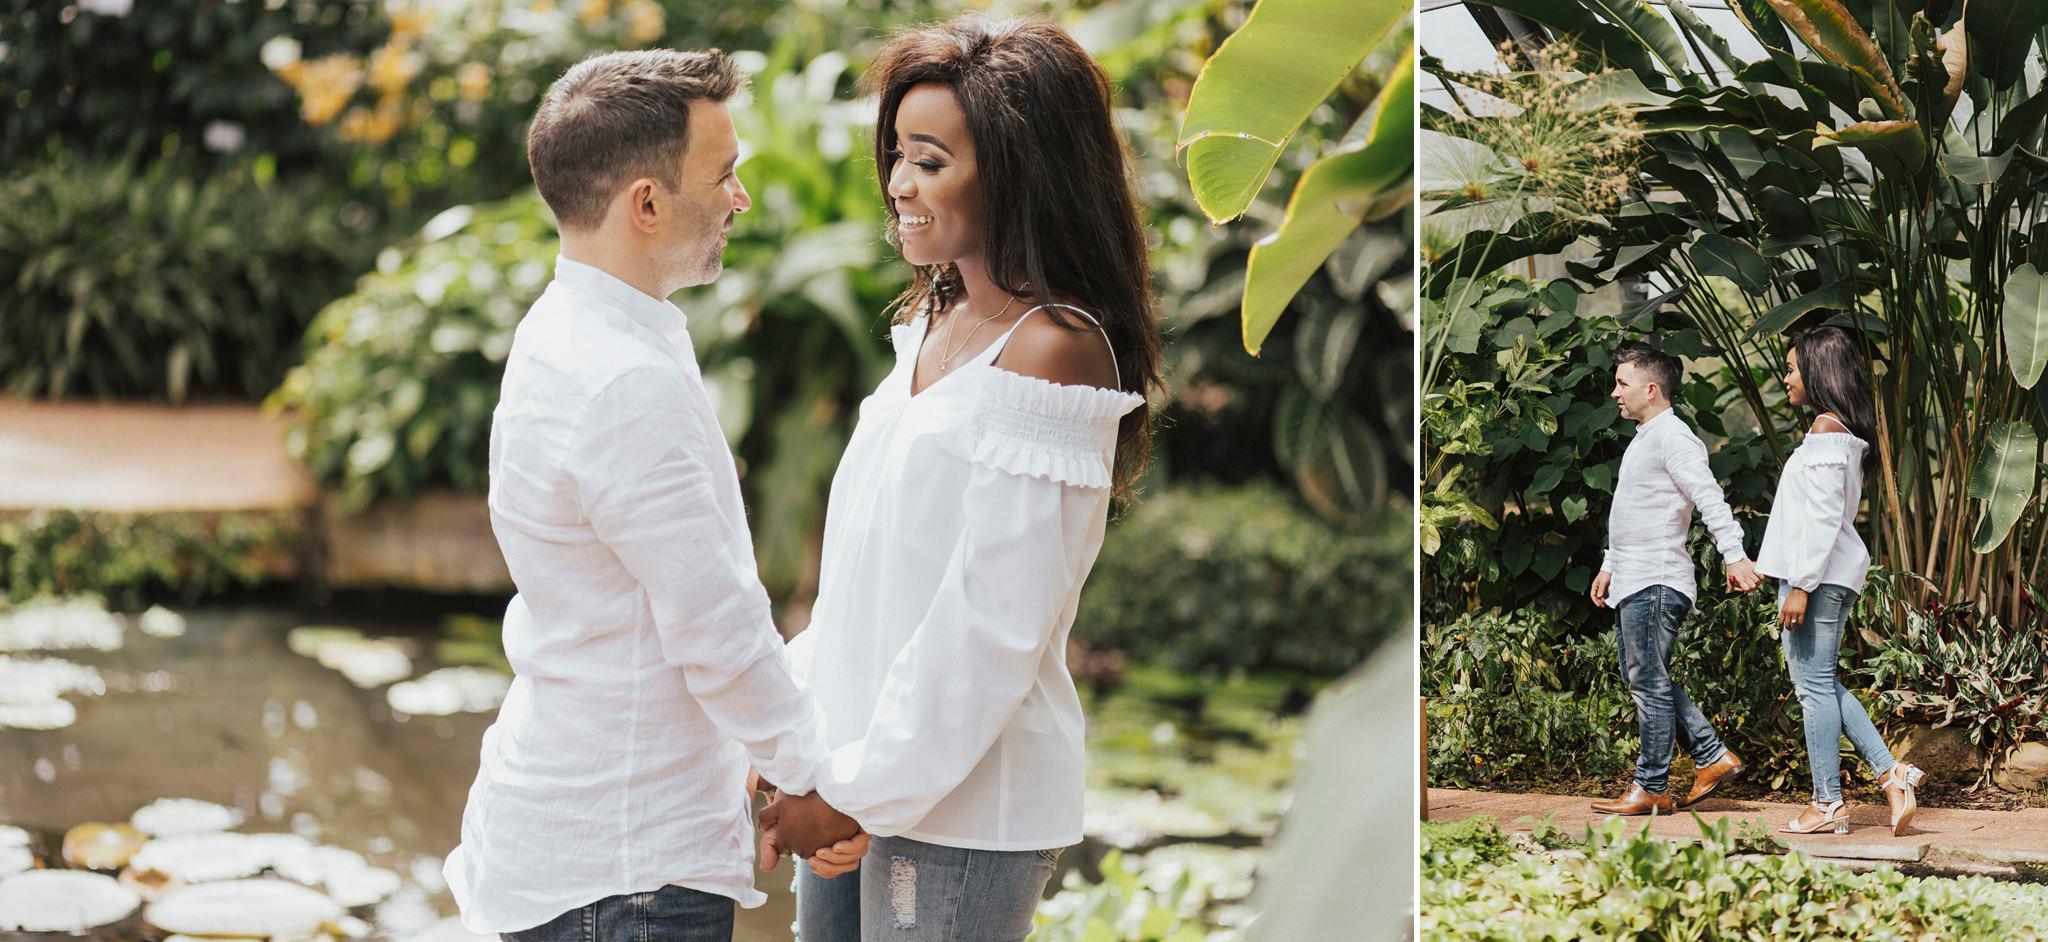 dundee-engagement-wedding-photographer-18.jpg